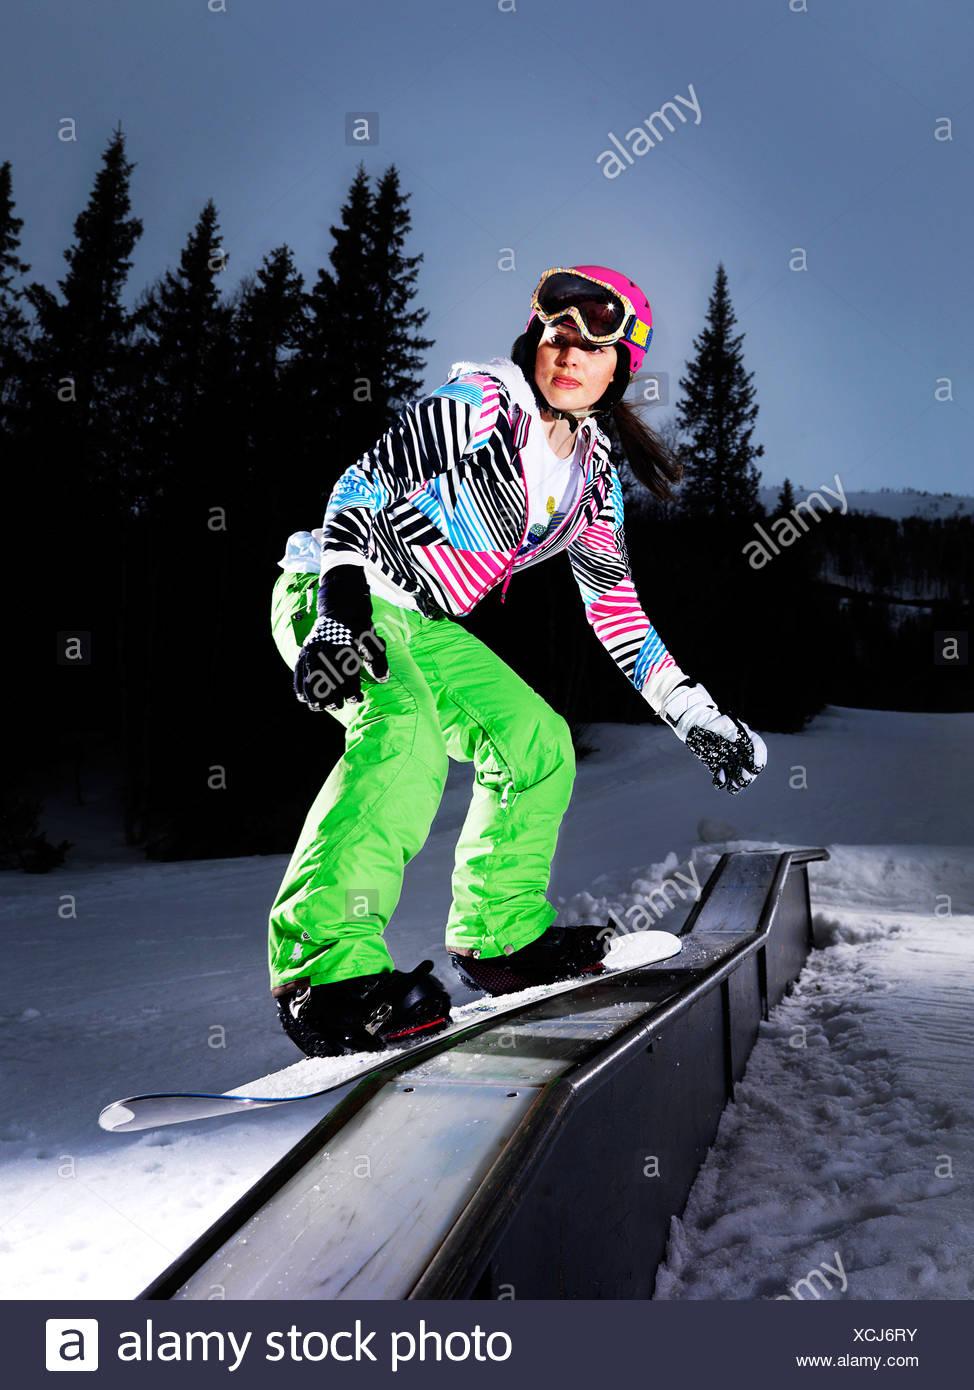 Girl board sliding on flat rail. - Stock Image